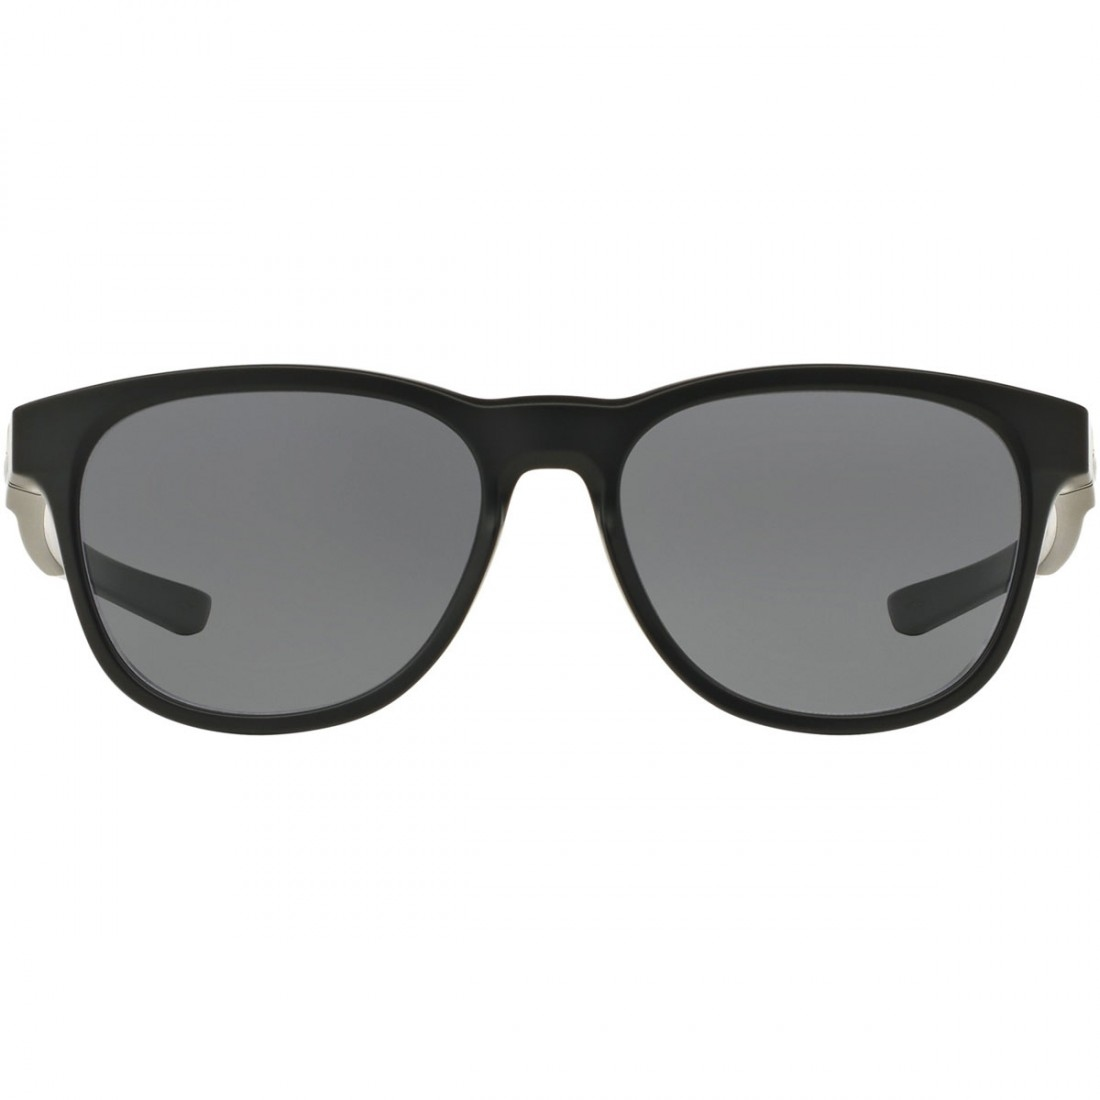 Óculos de sol OAKLEY Stringer Matte Black   Gray · Motocard f21714c3e9